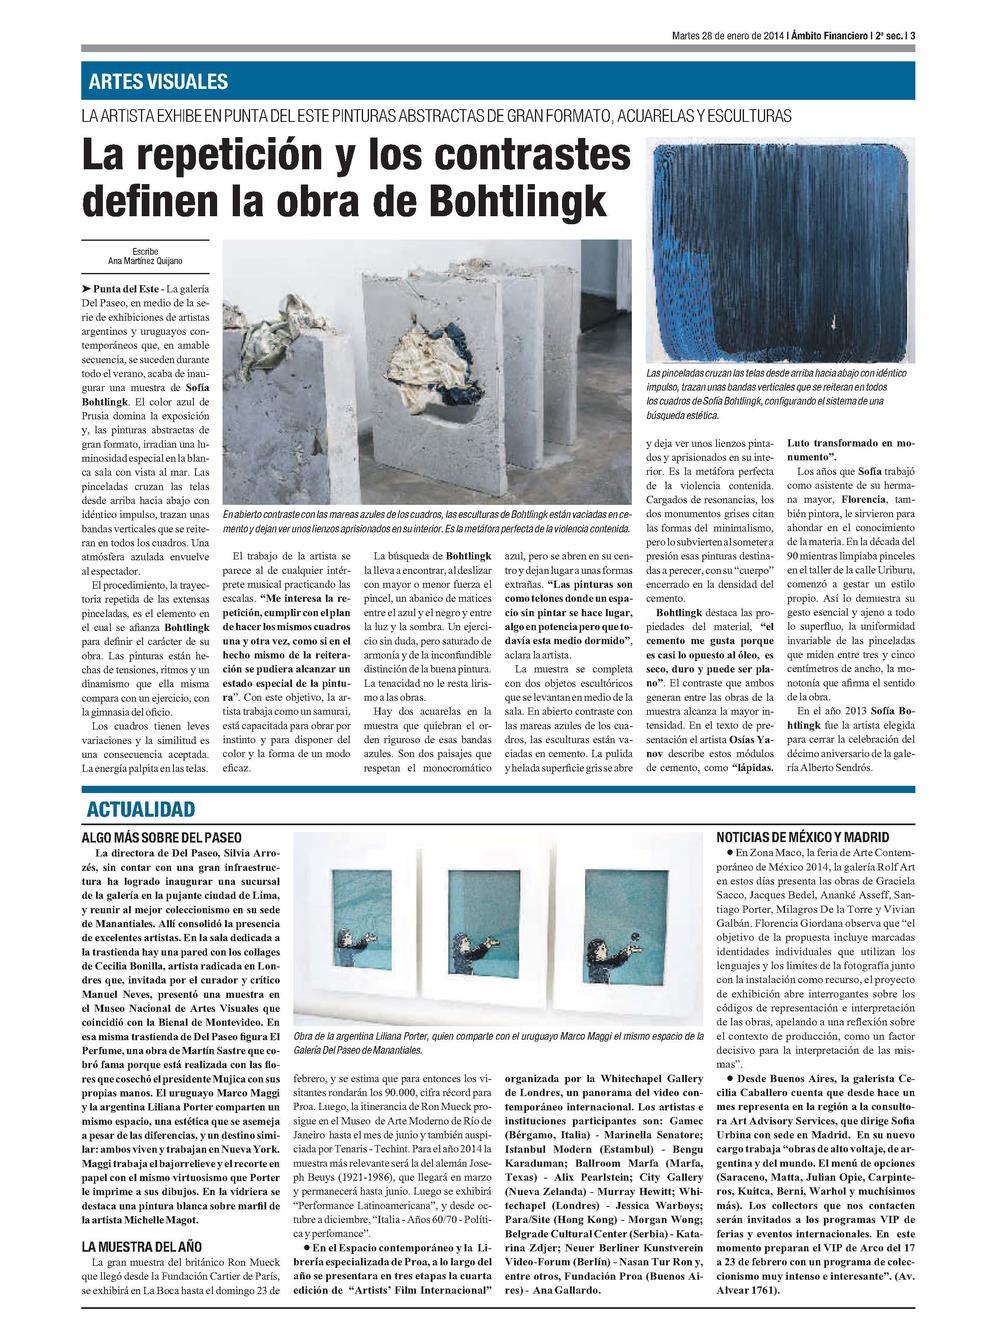 diario uruguay.jpg